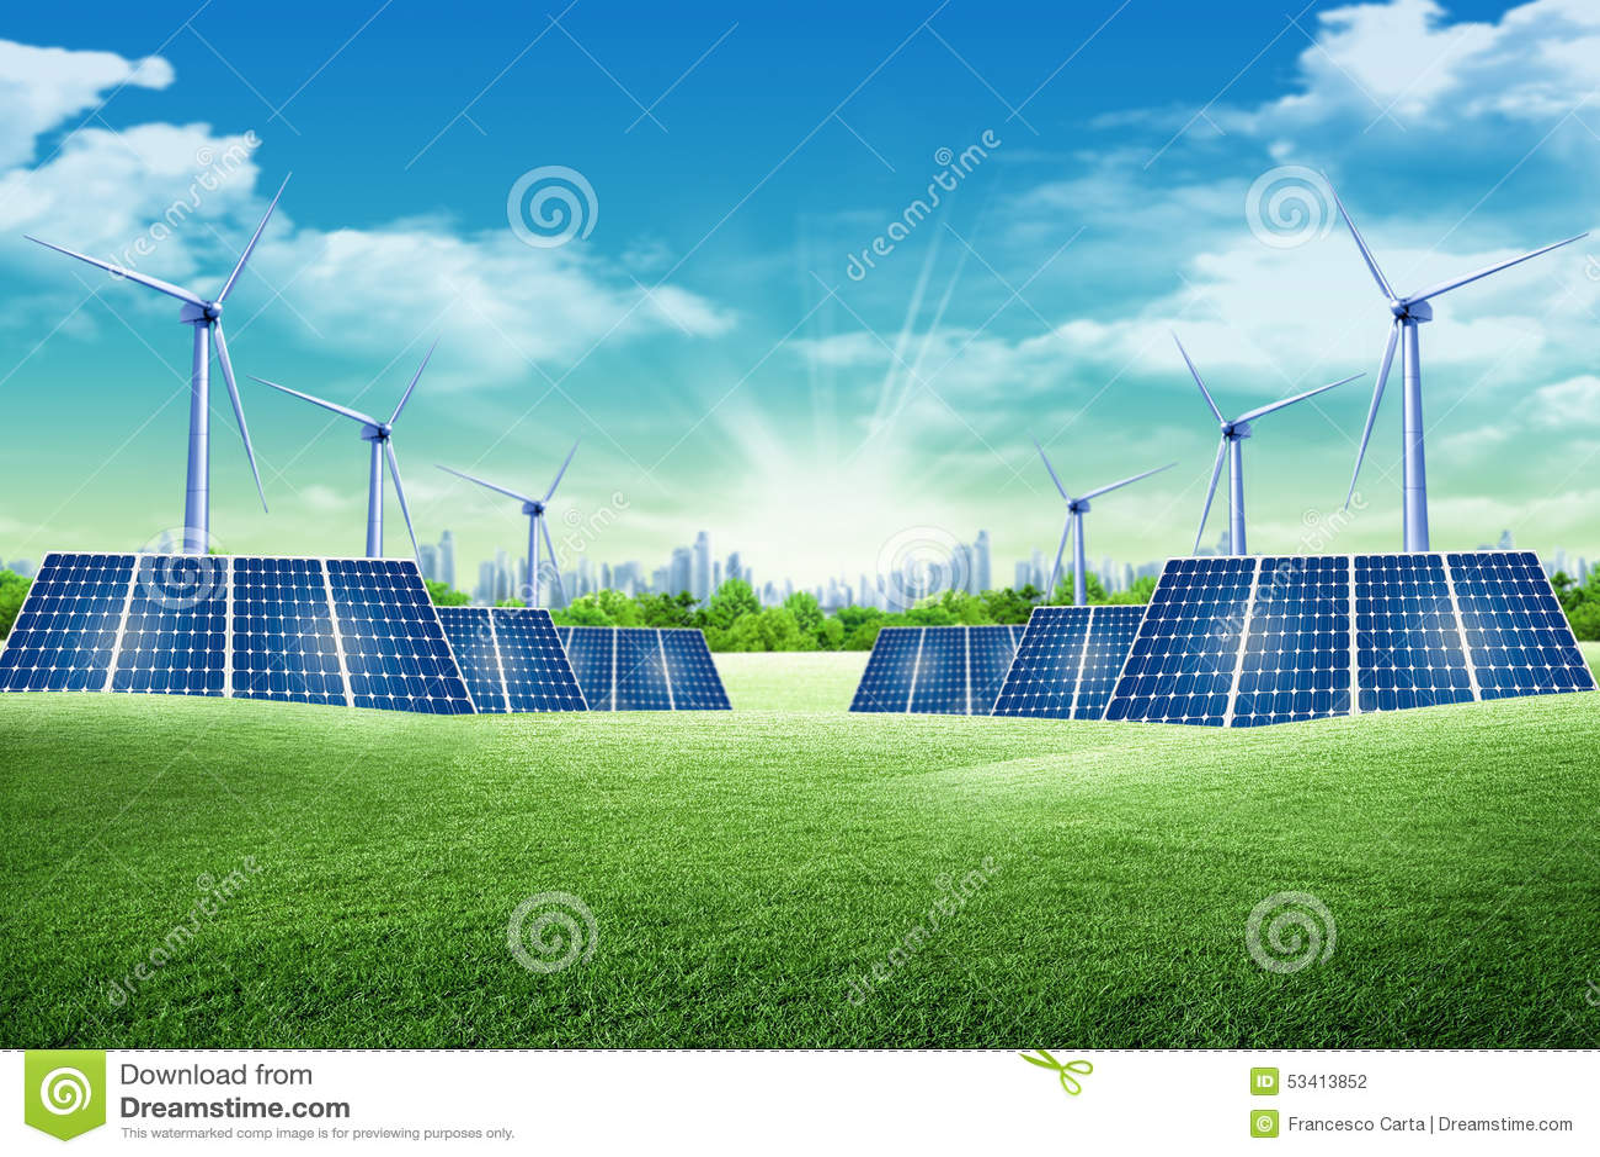 Energy Park Stock Photo - Image: 53413852